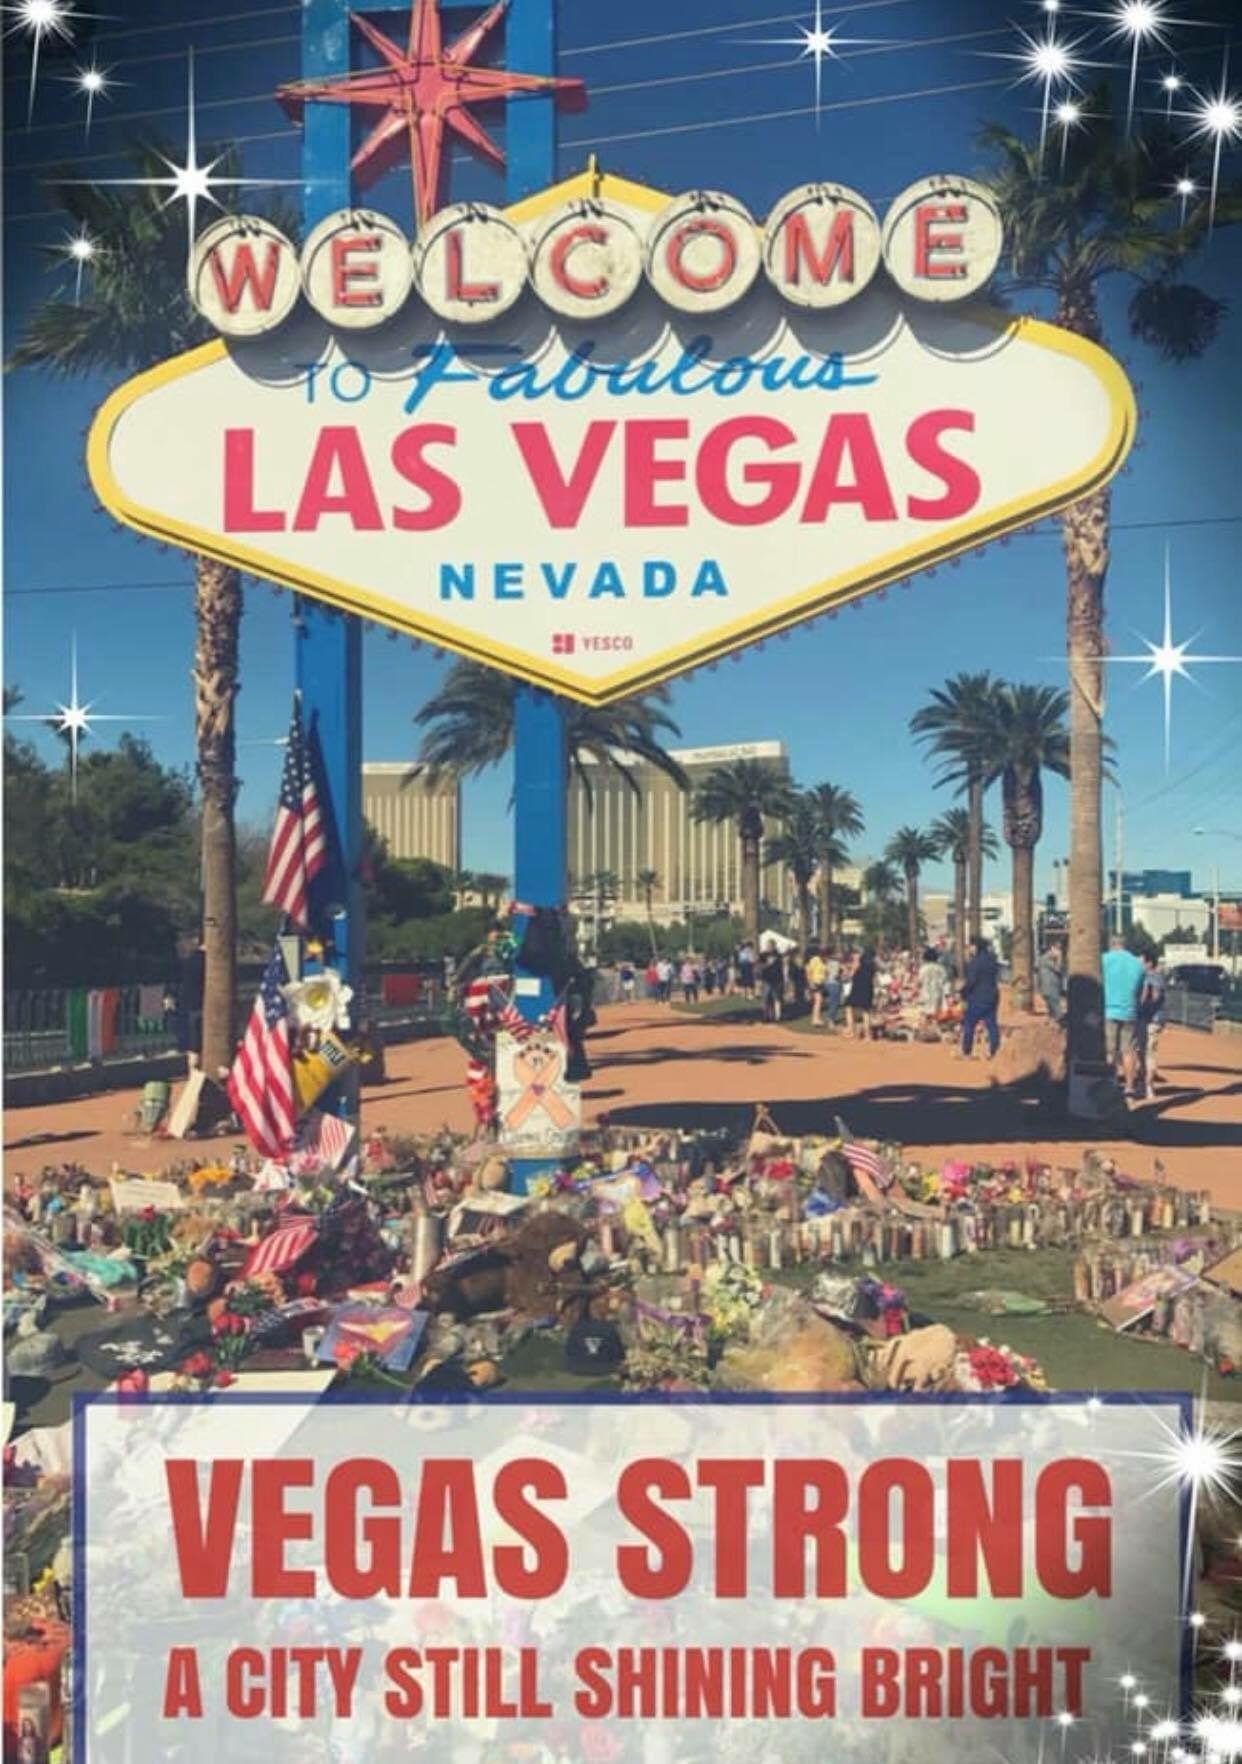 I love my beautiful strong city ️ ️ ️ Vegas, Las vegas